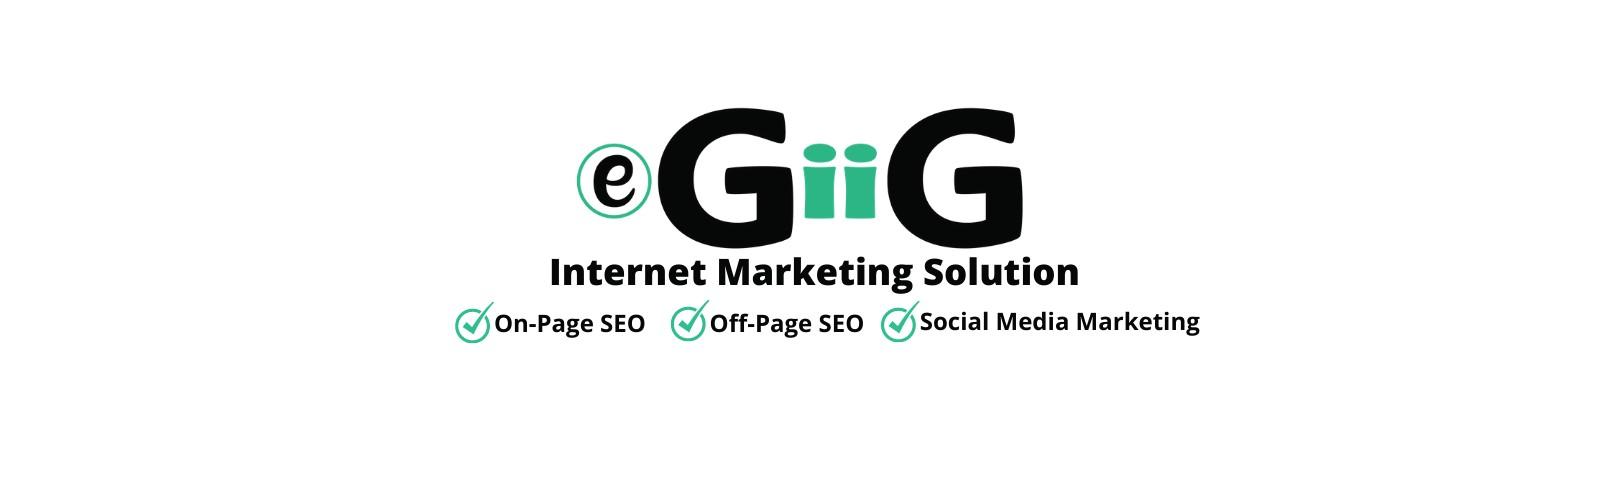 eGiiG Services